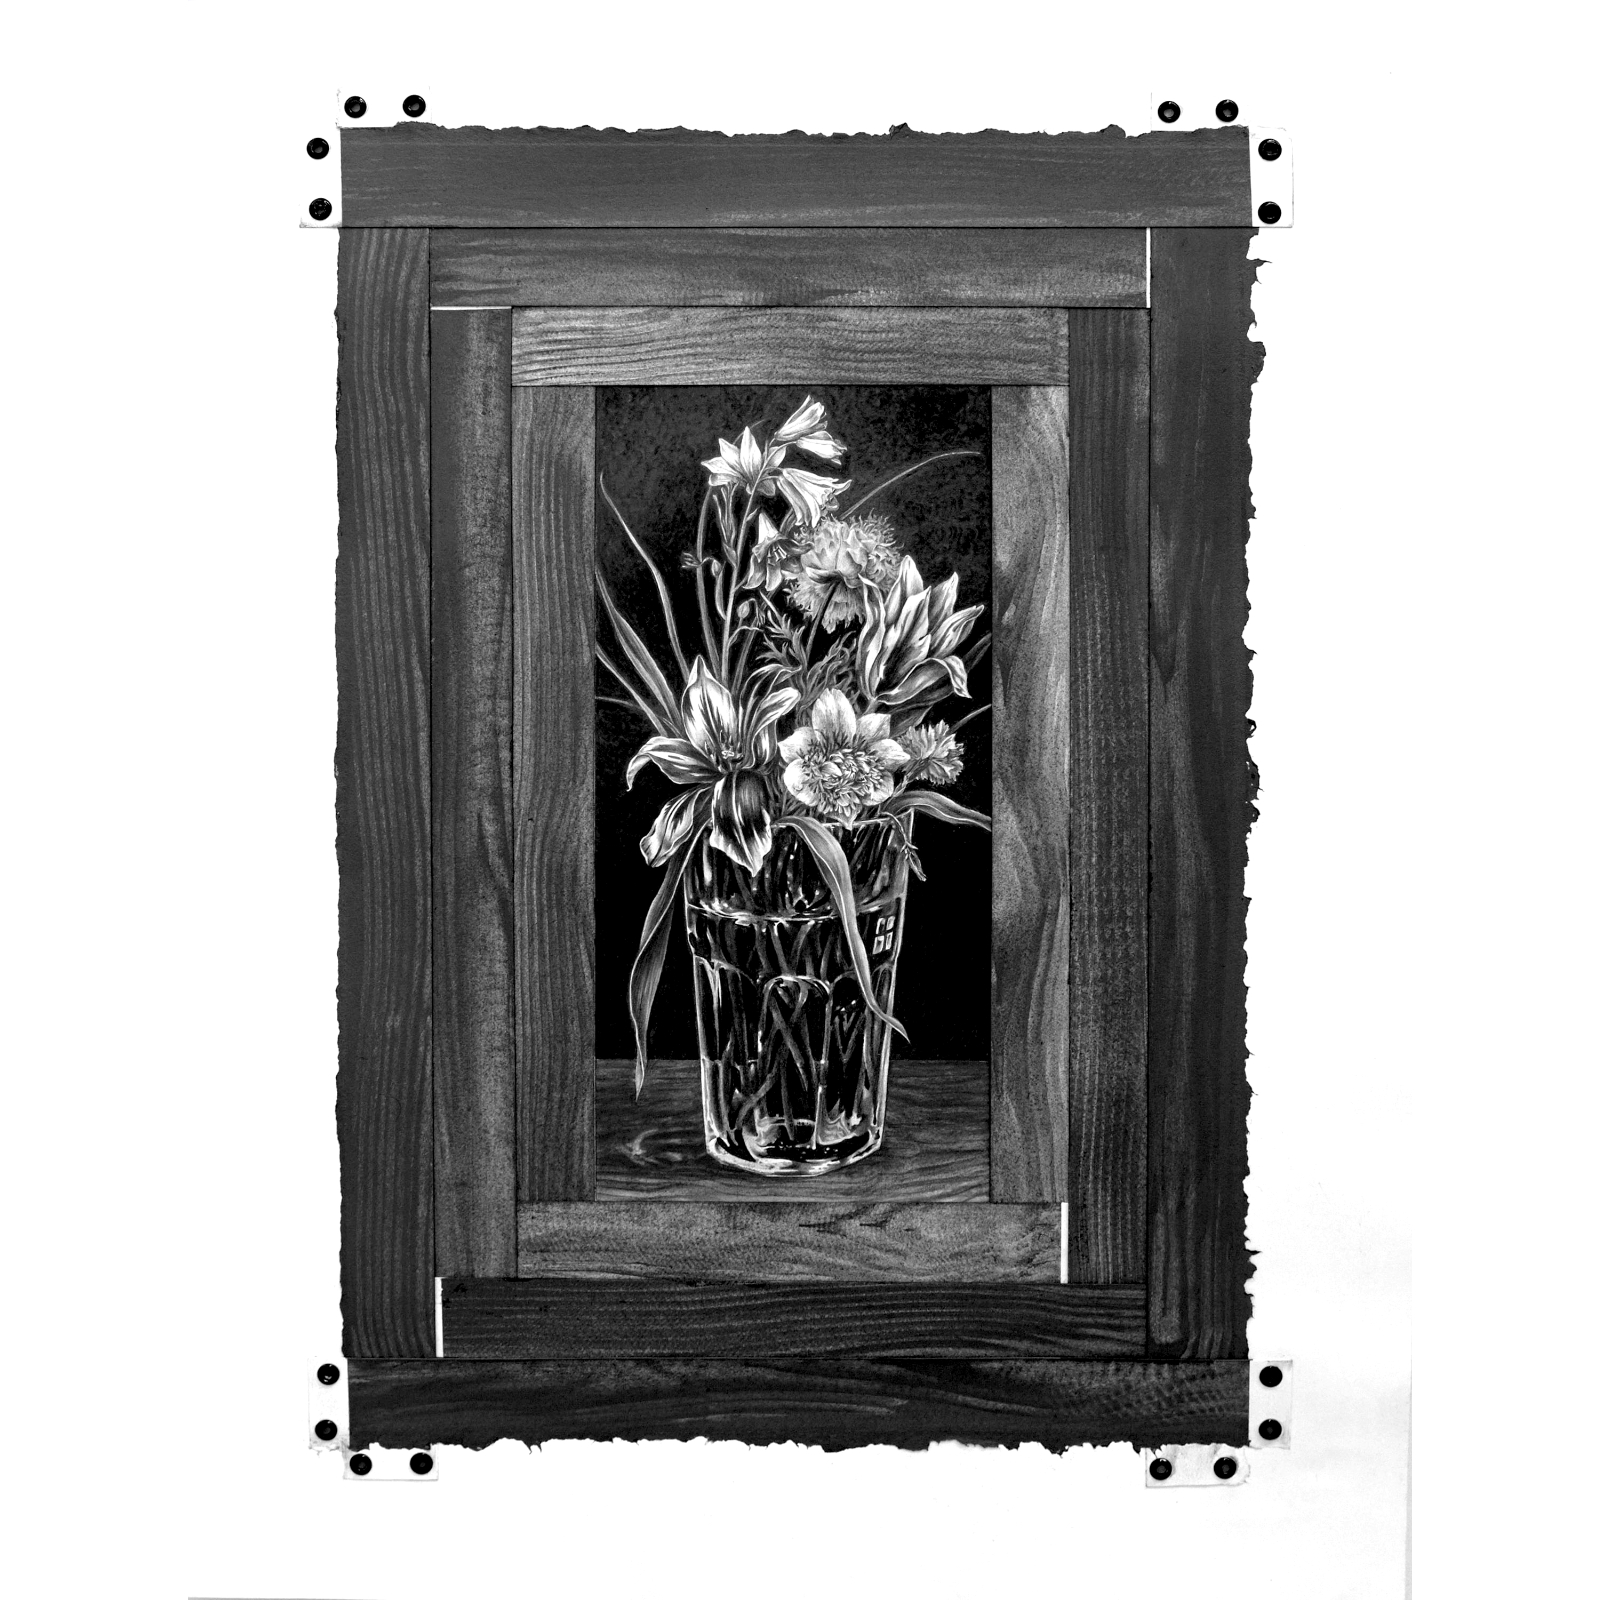 Roubaud Dessin - Nature morte 2